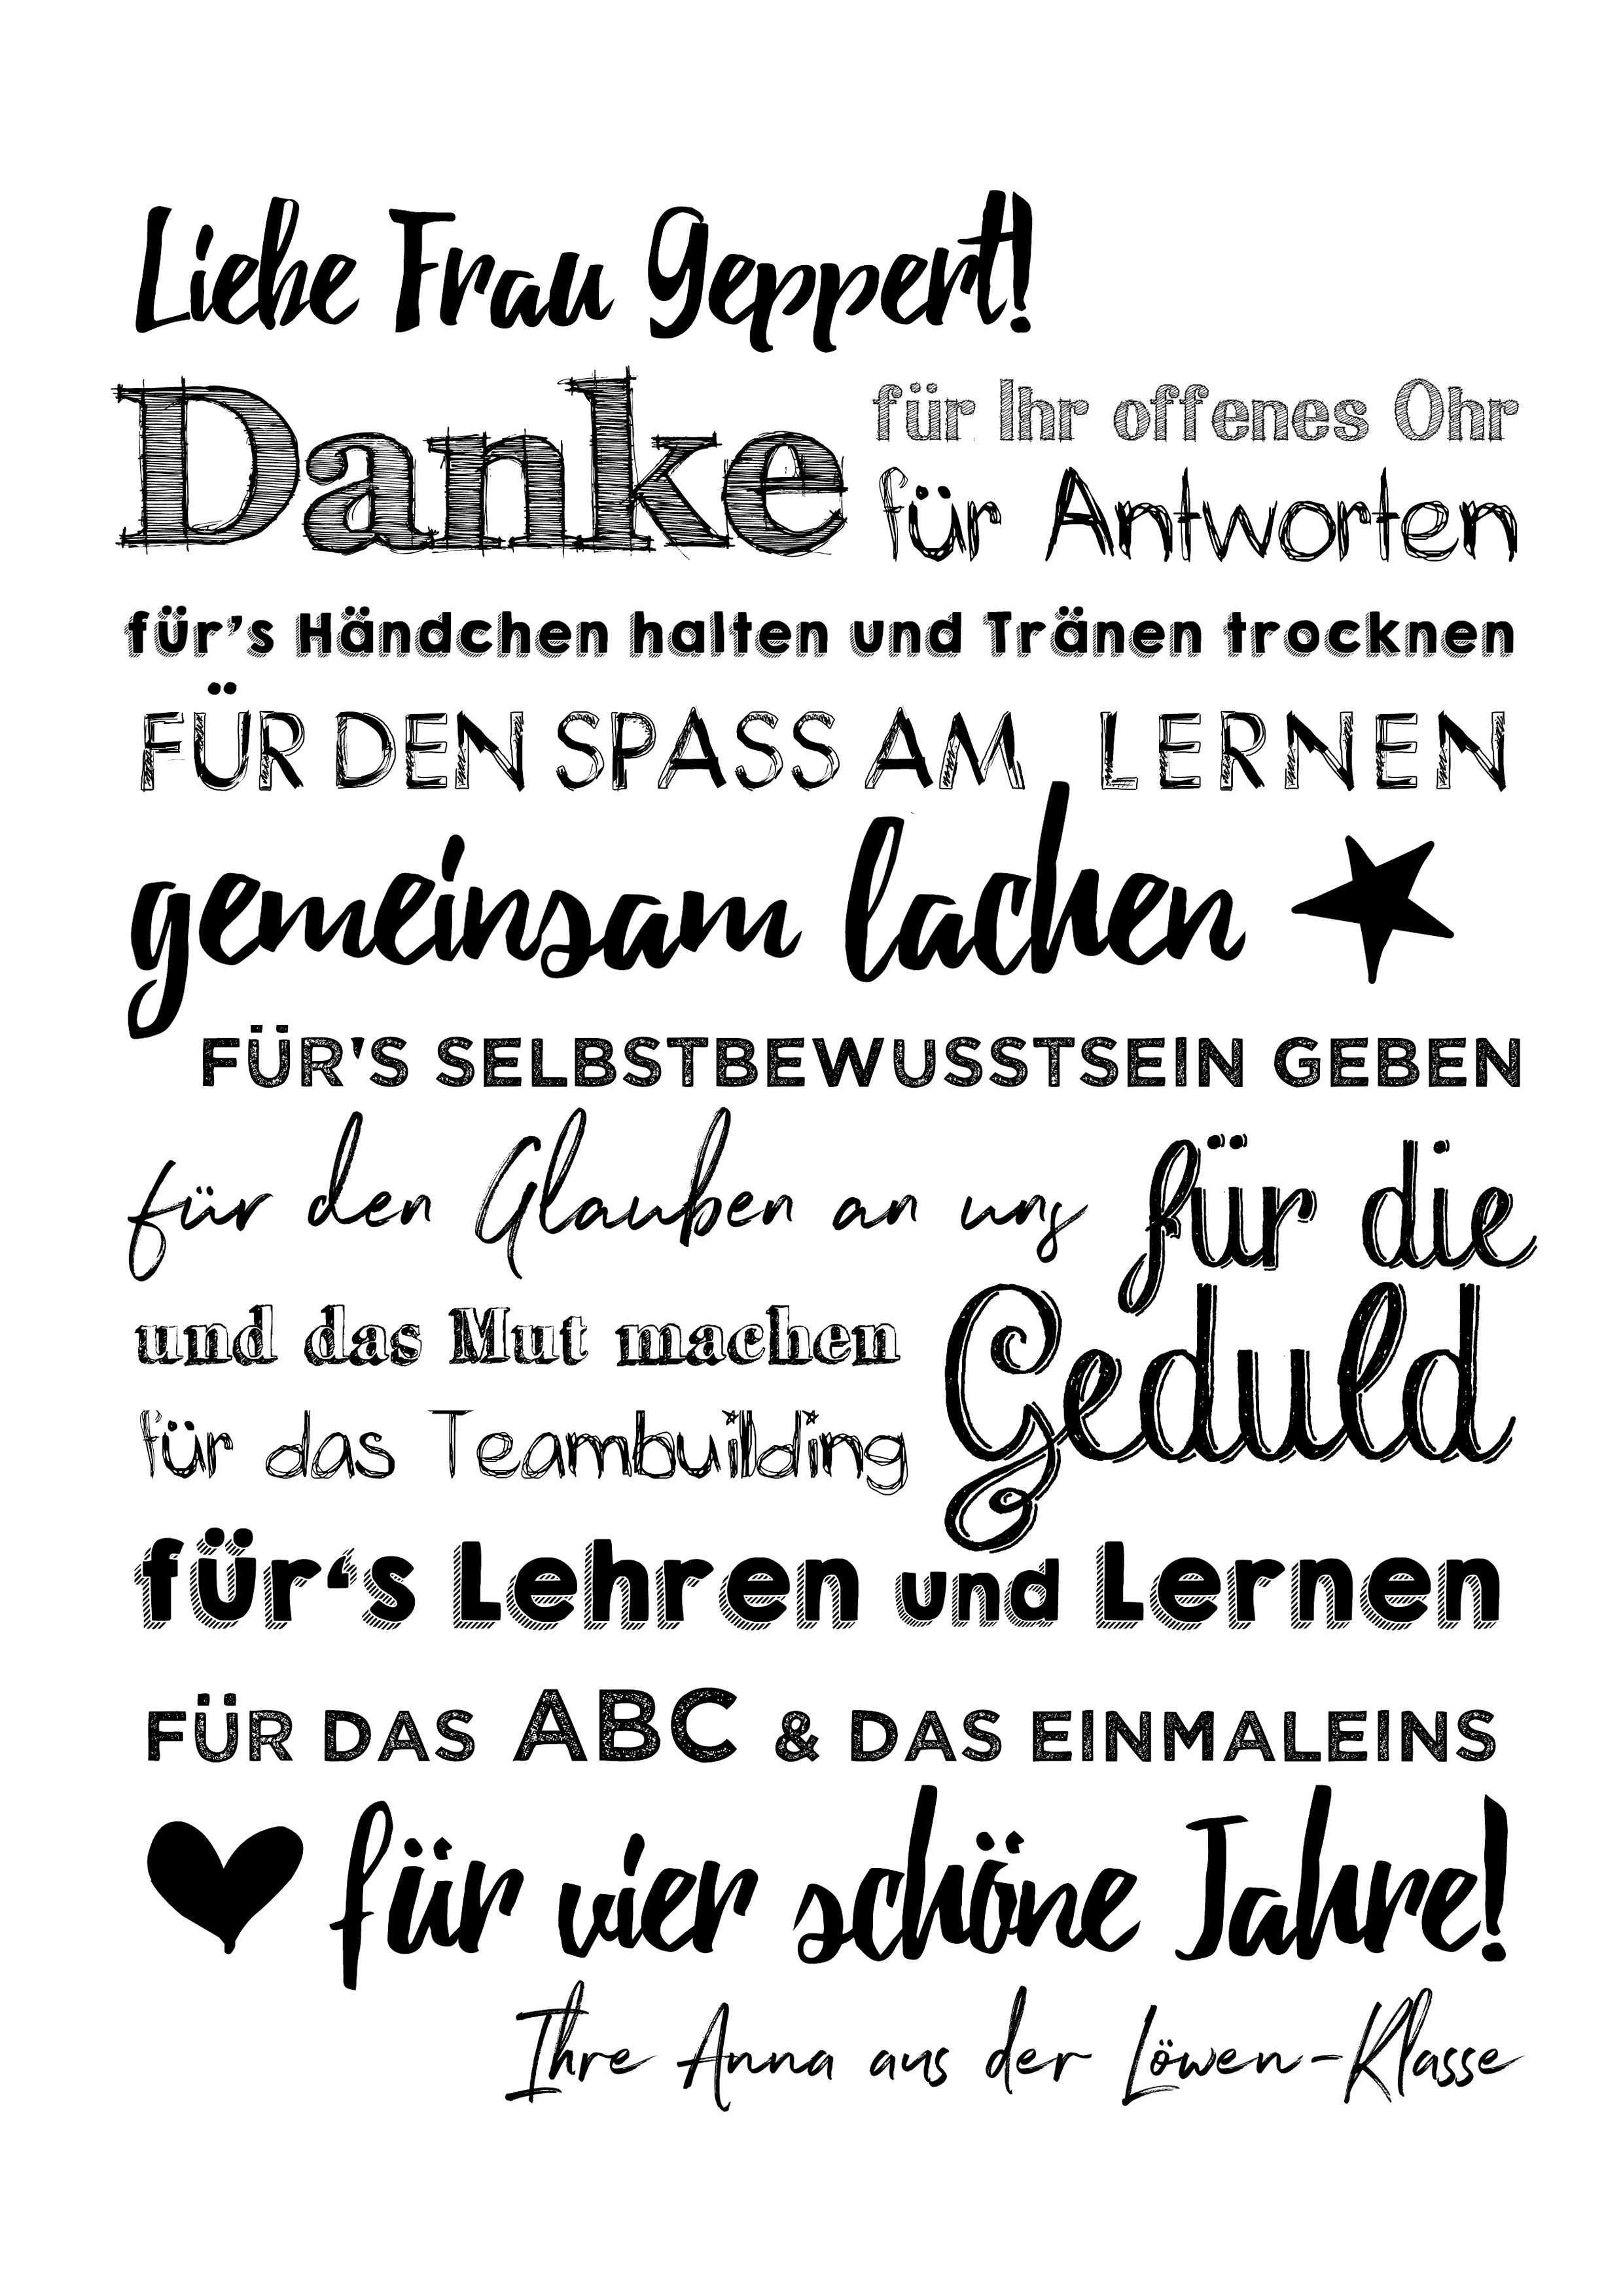 Poster Danke Fur Lehrer Abschiedsgeschenk Lehrer Gedicht Fur Lehrerin Geschenke Zum Abschied